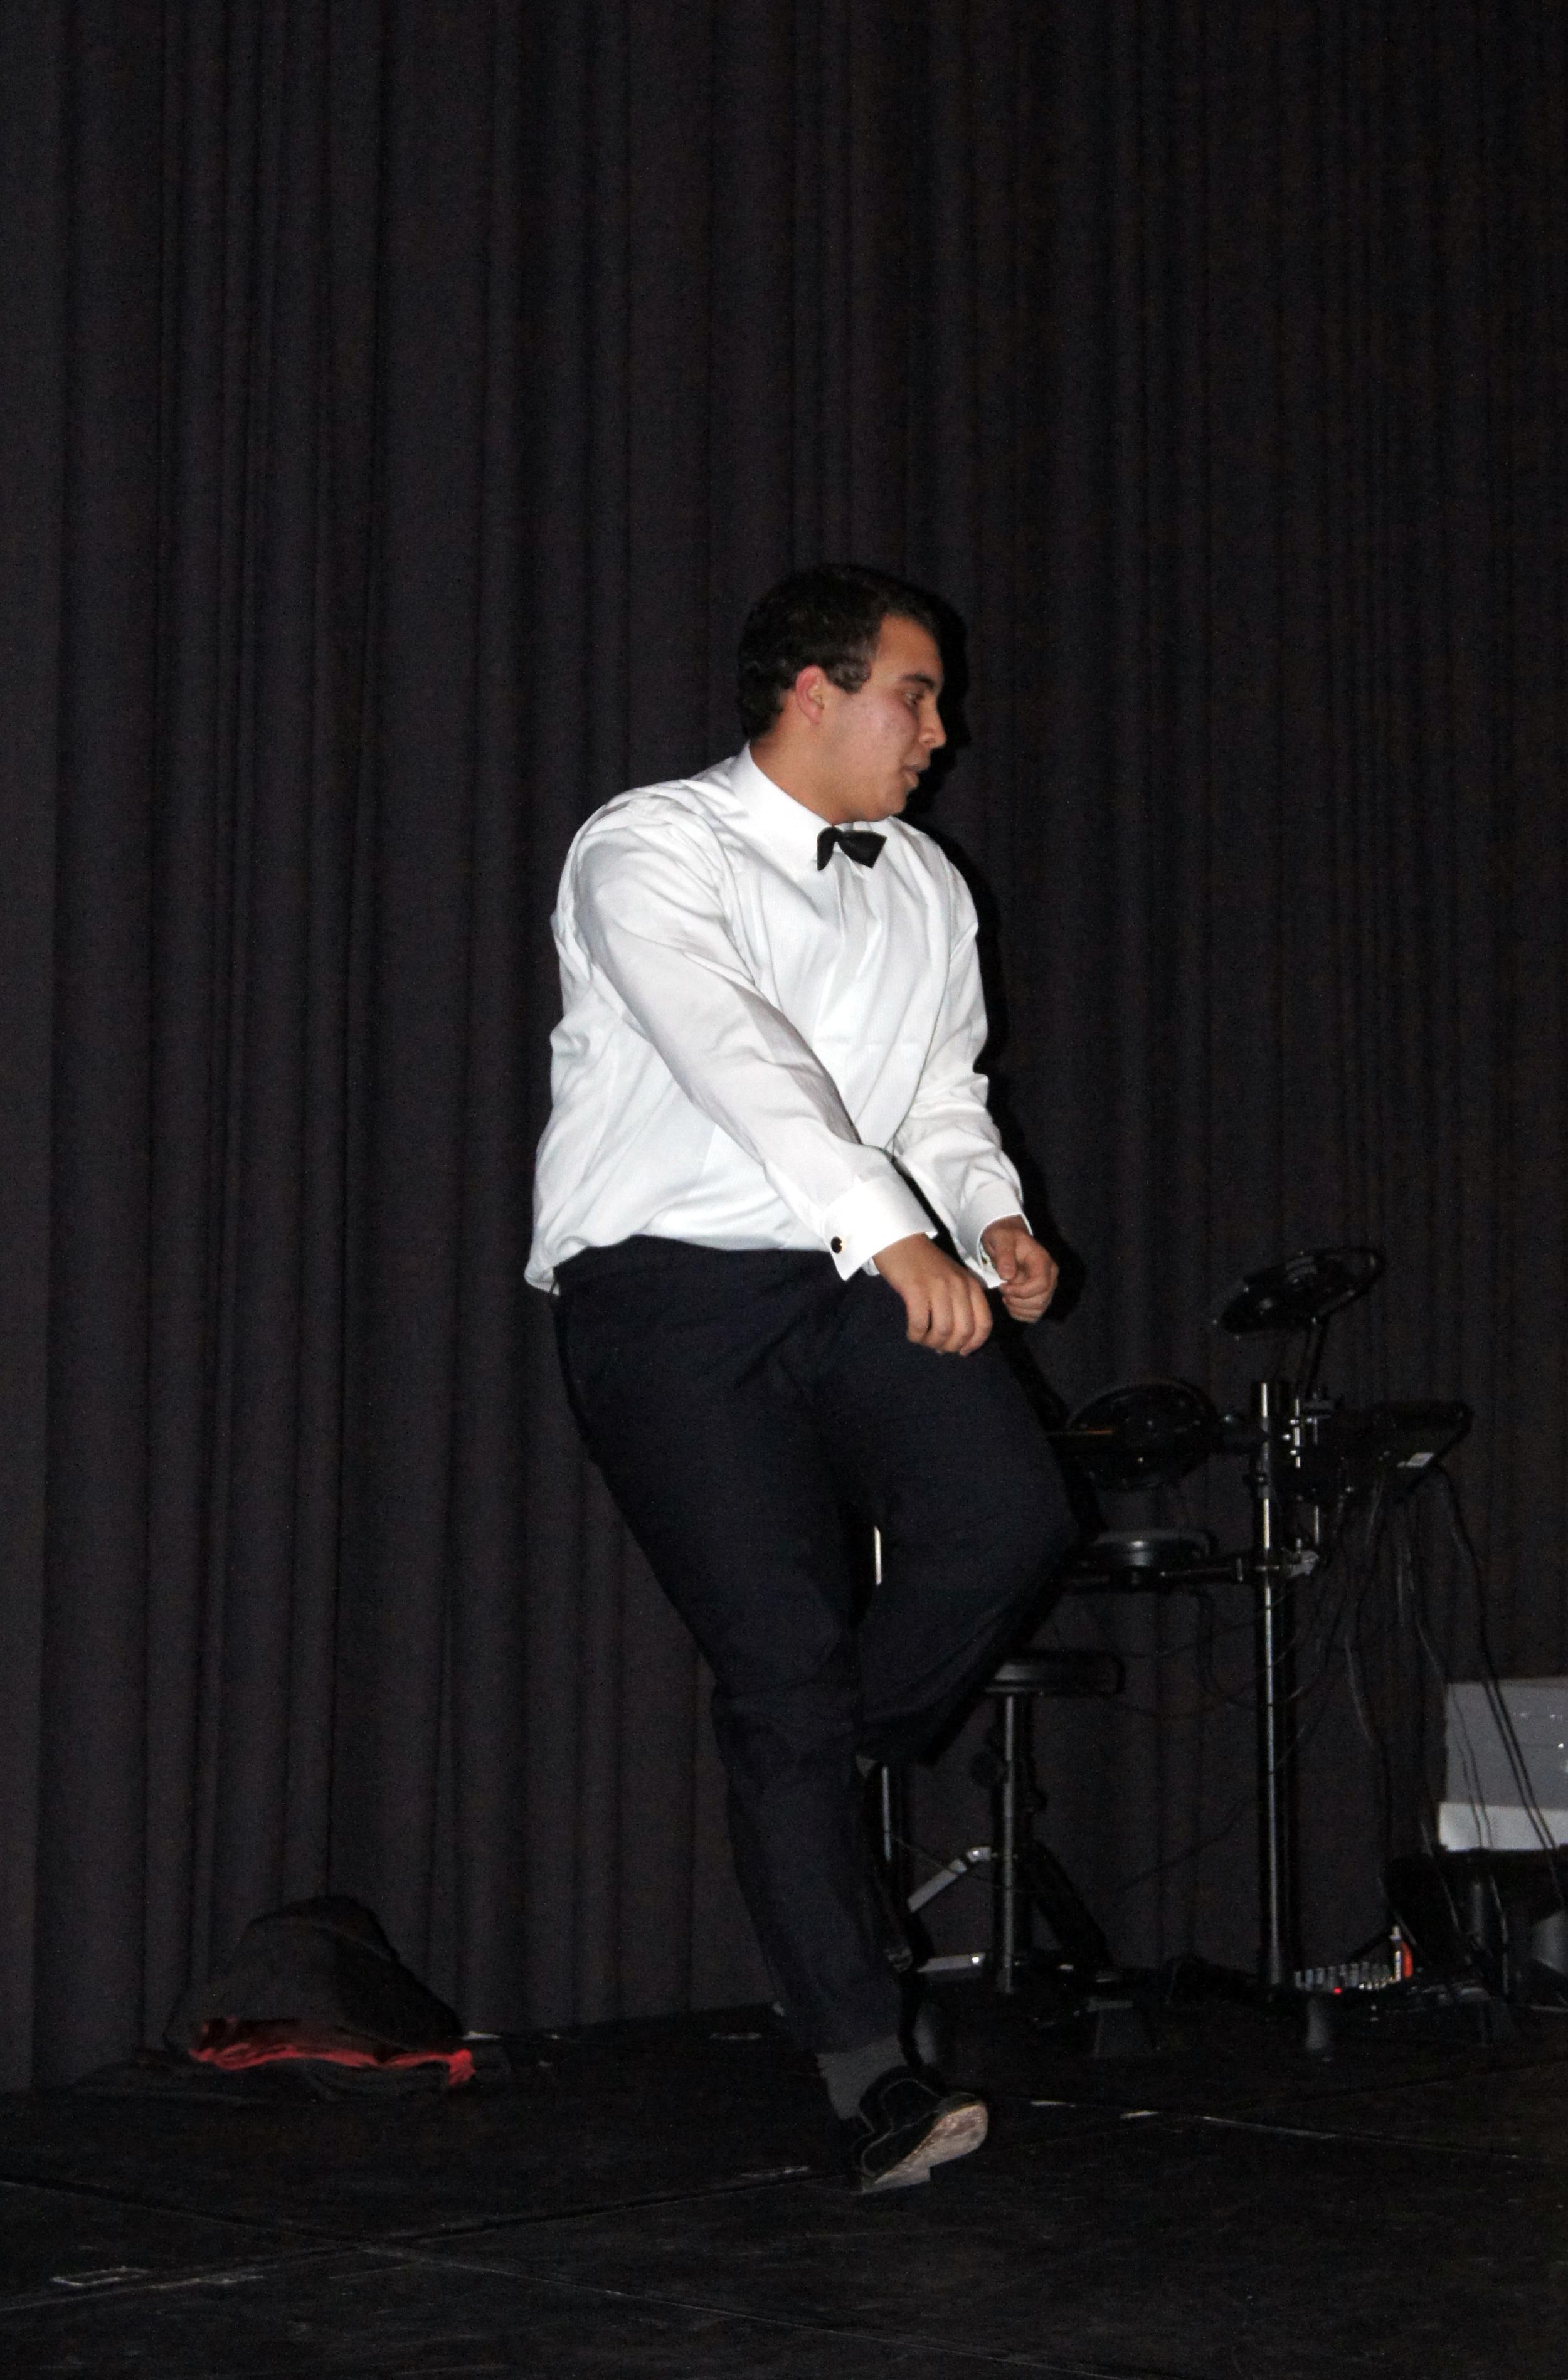 DANSELØVE: Ali Mounji imponerte kurset med dans under middagen.